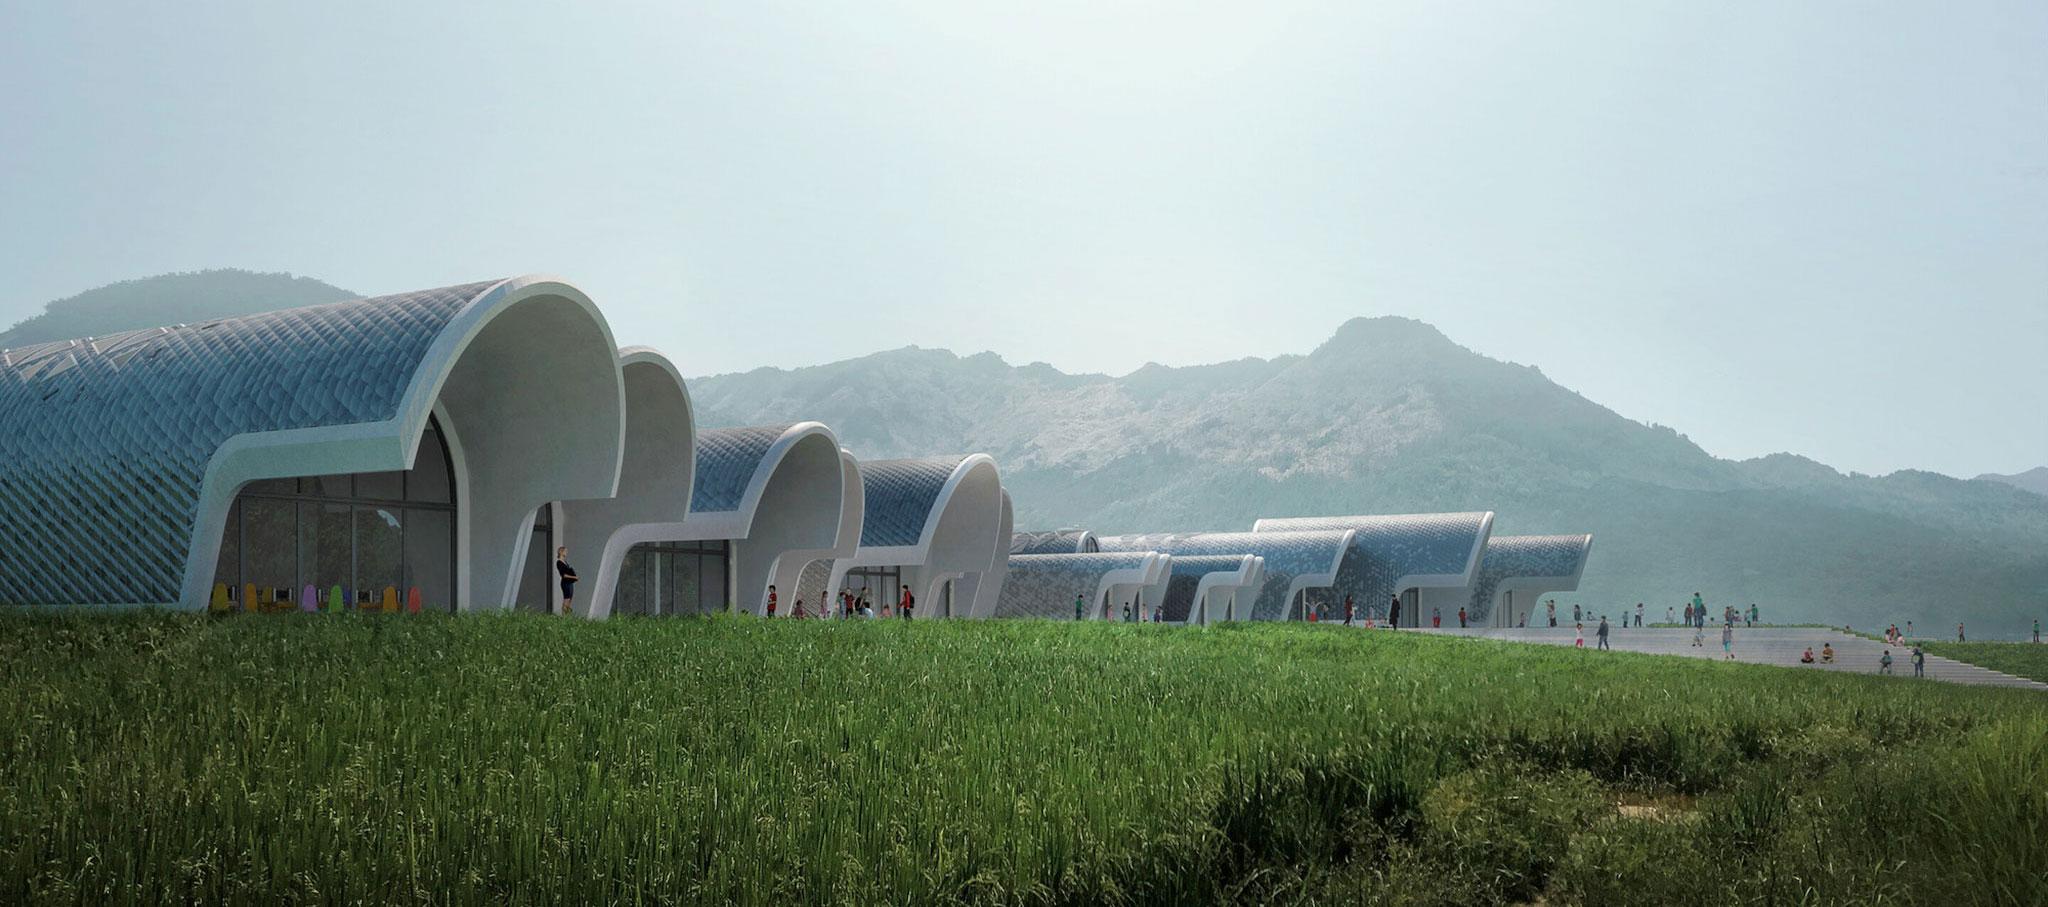 Exterior. Parabolic-Vaulted School Campus by Zaha Hadid Architects. Image by VA. Image courtesy of ZHA